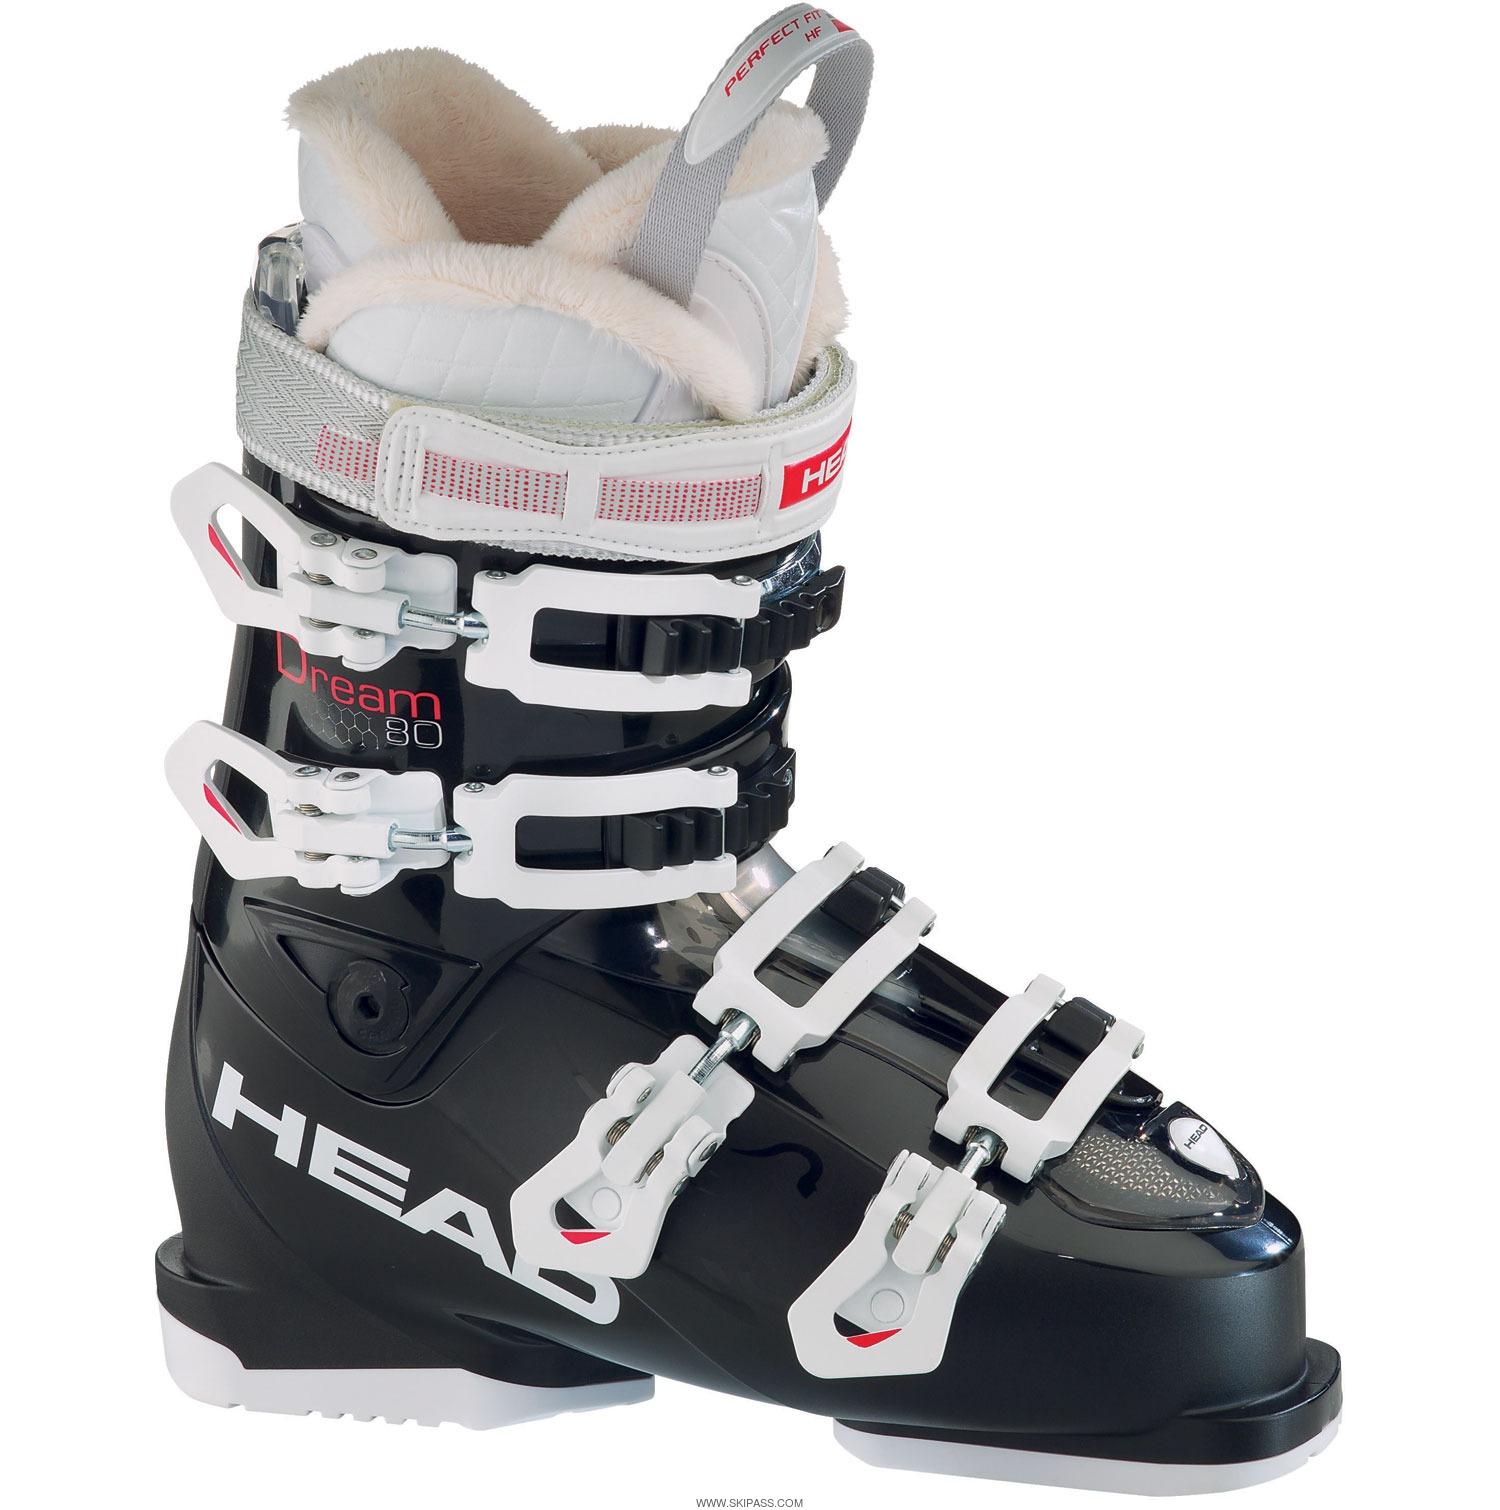 Head Dream 80 W Chaussure Ski Femme  - Chaussures Ski Femme